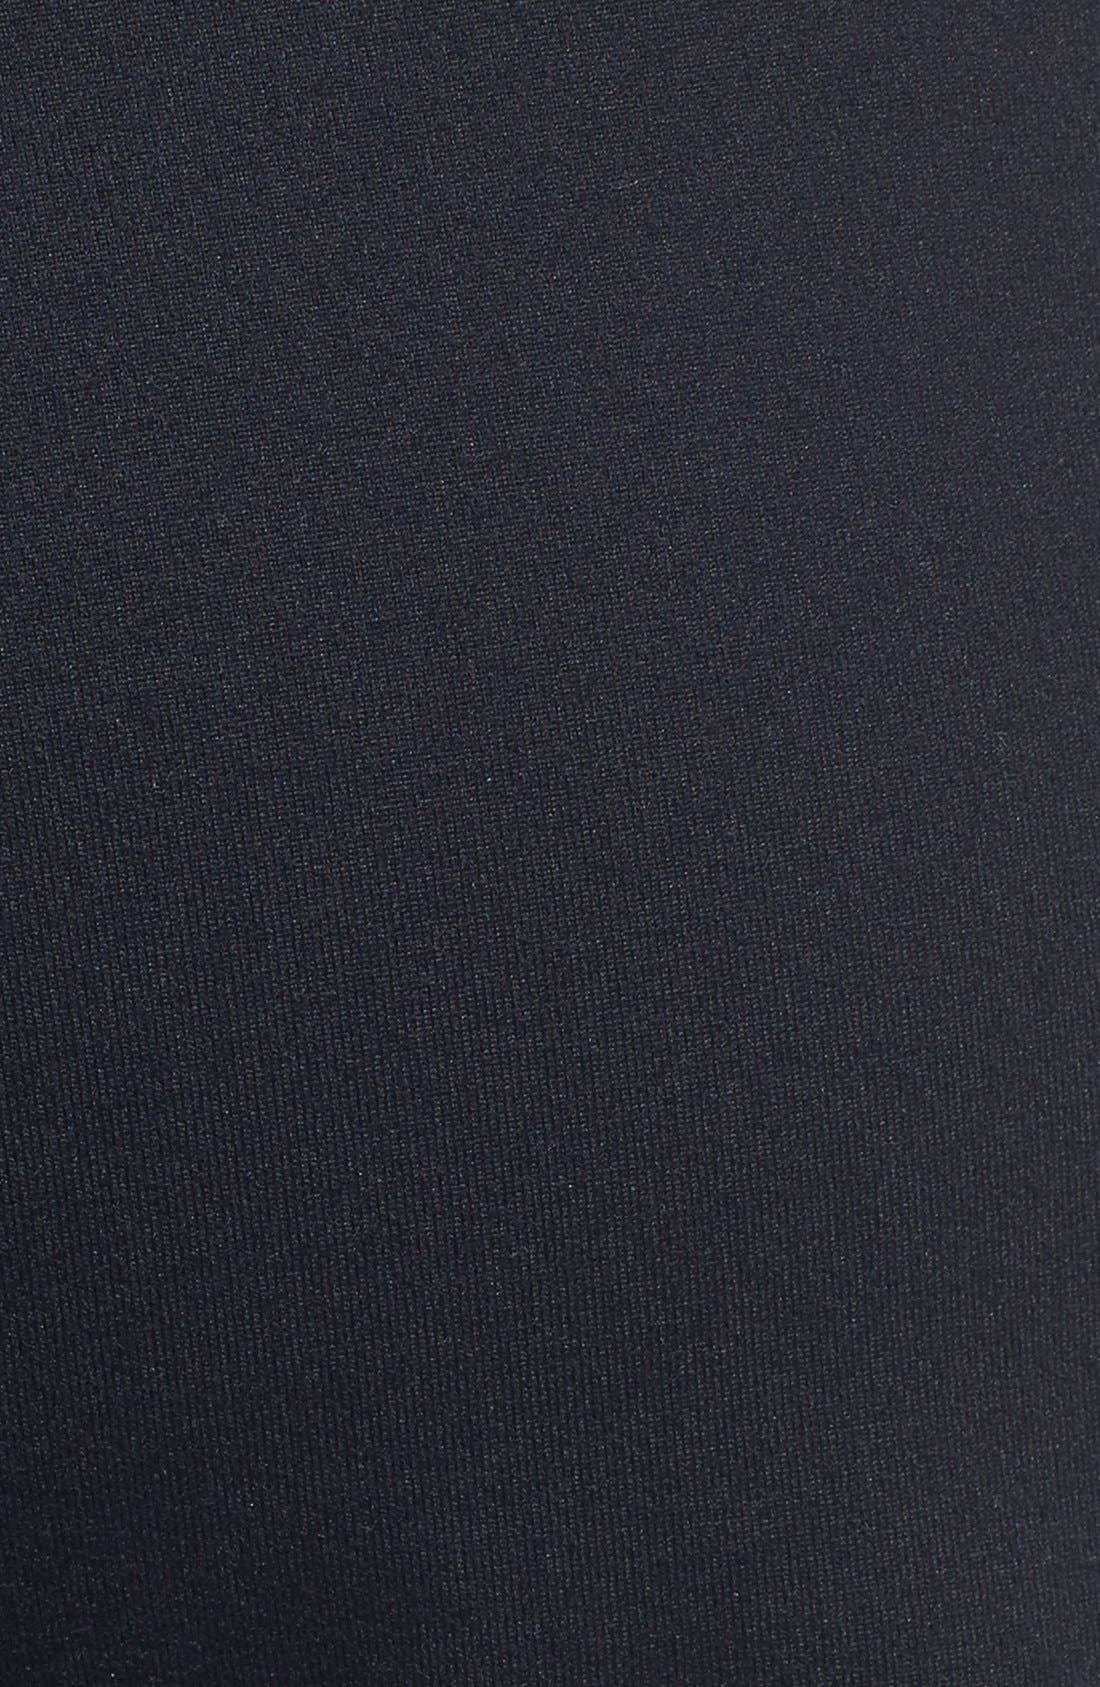 Alternate Image 5  - Under Armour Regular Fit Knit Training Pants